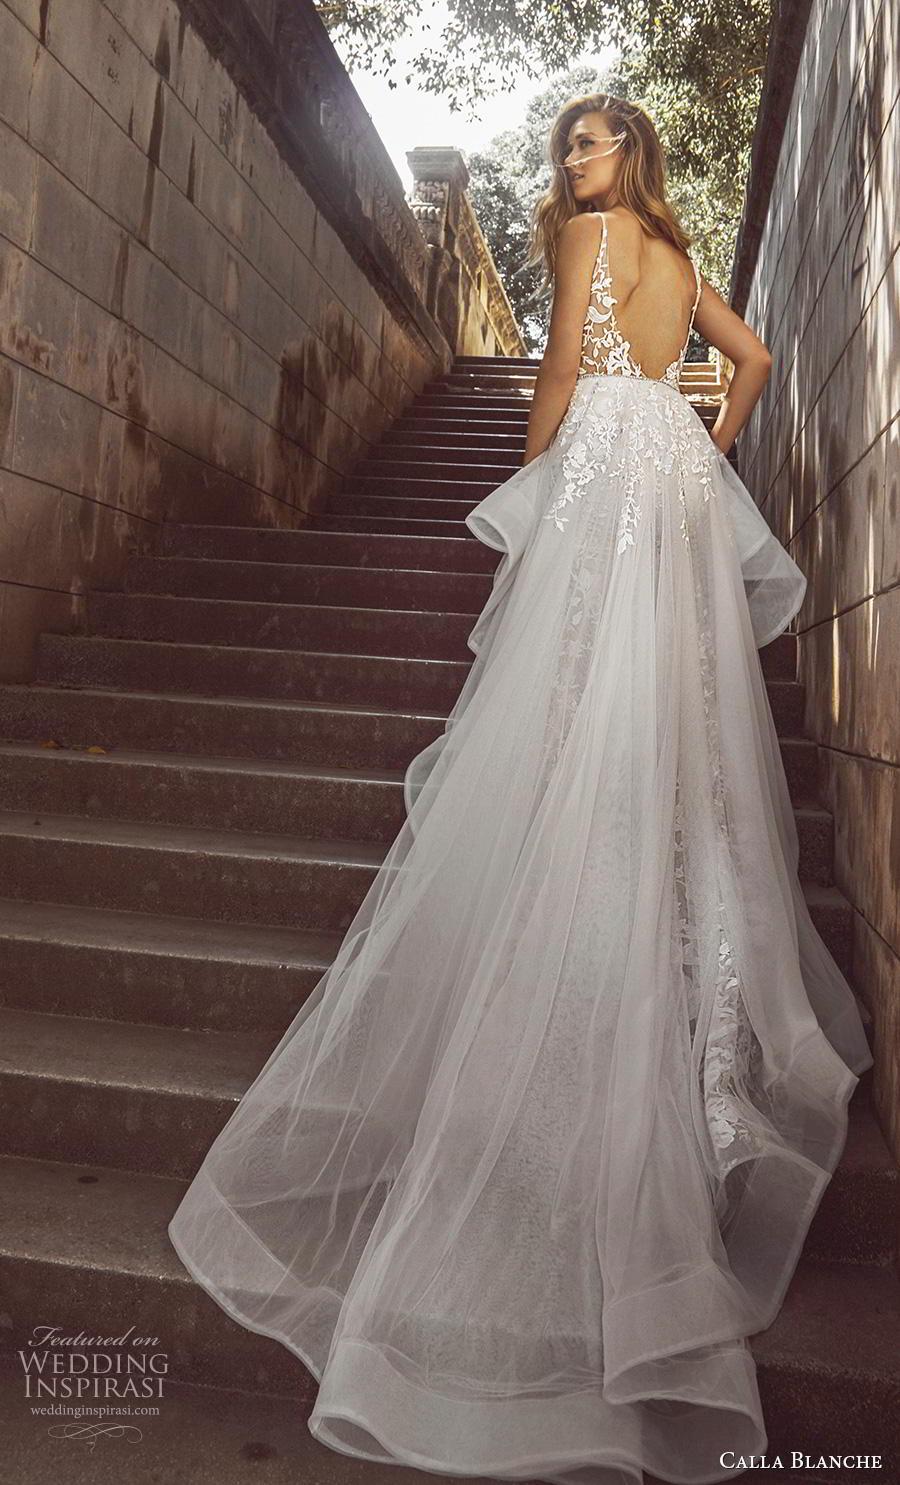 Lamour by Calla Blanche Fall 2018 Wedding Dresses  Wedding Inspirasi